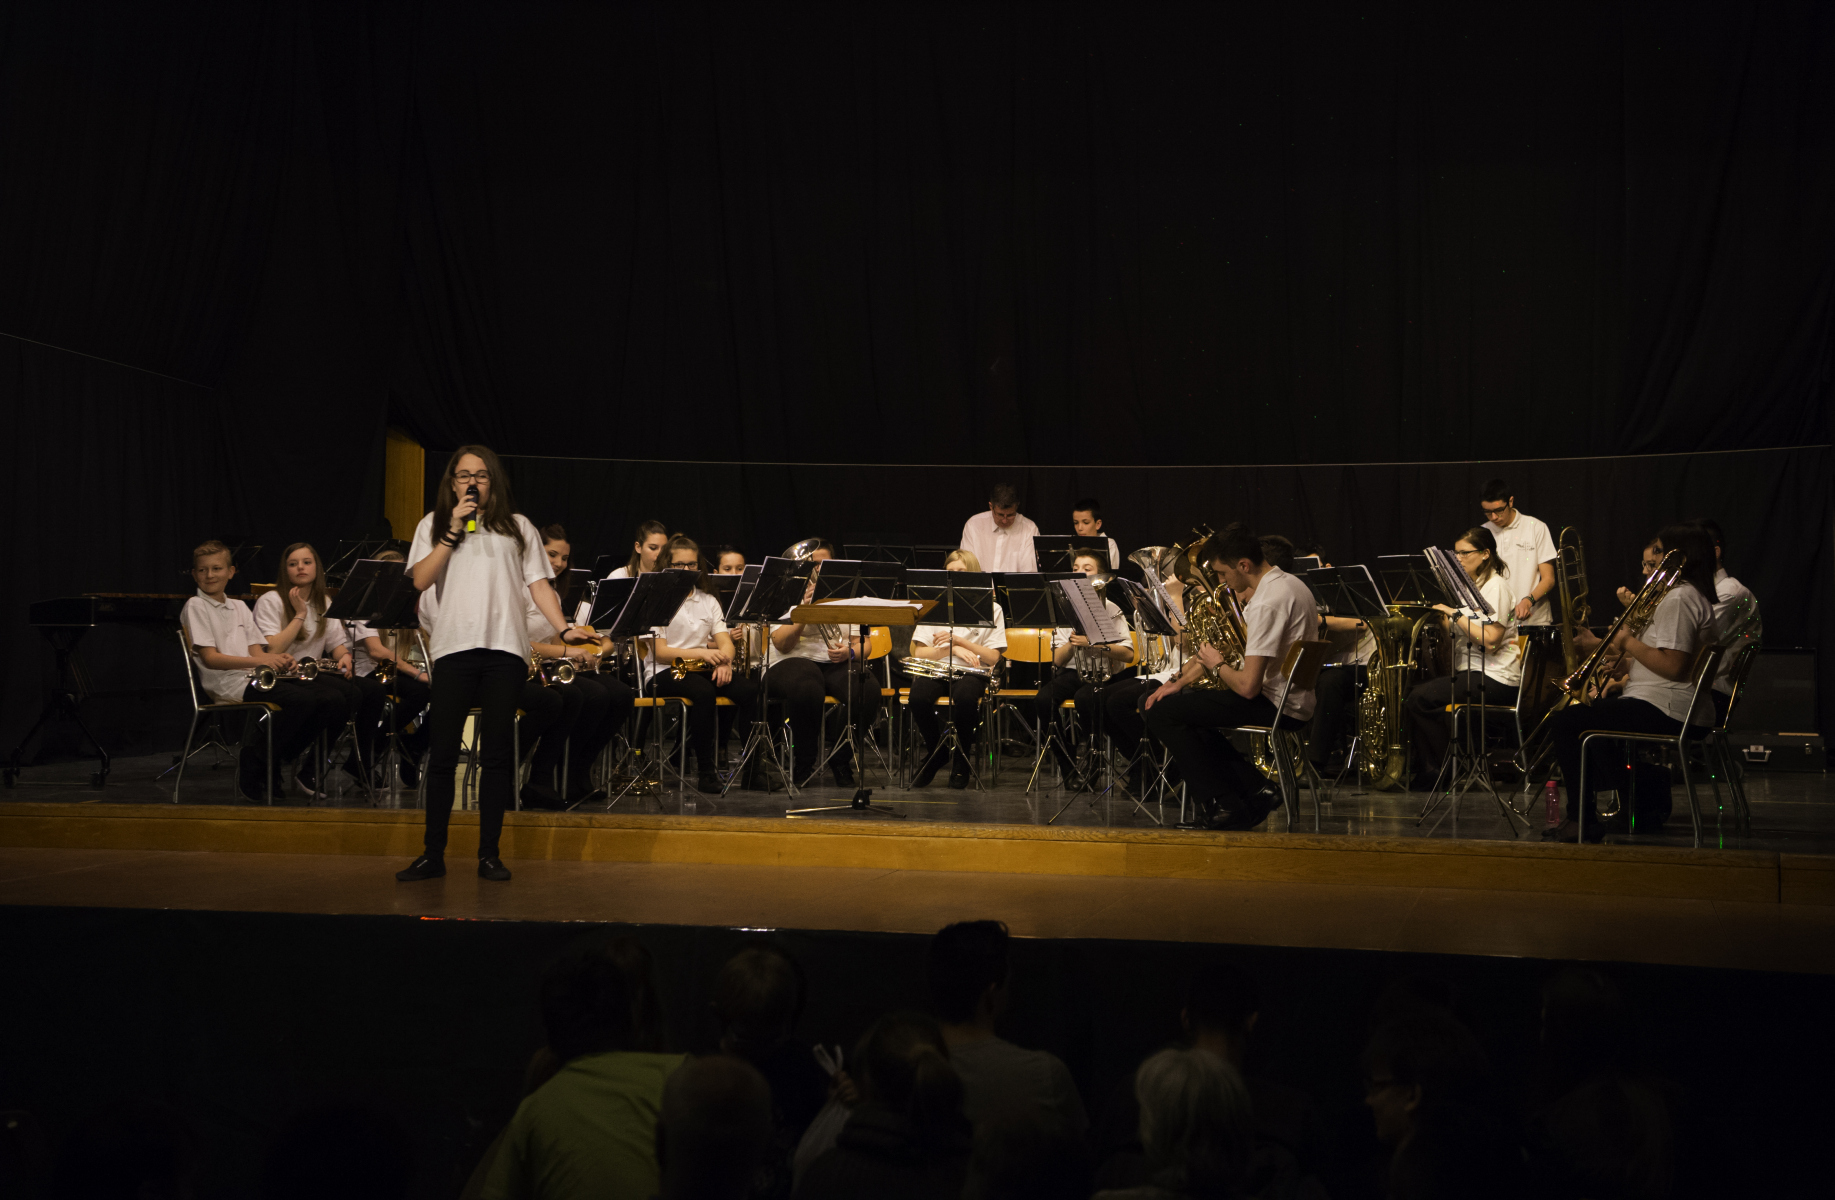 170211_concert_annuel17-011